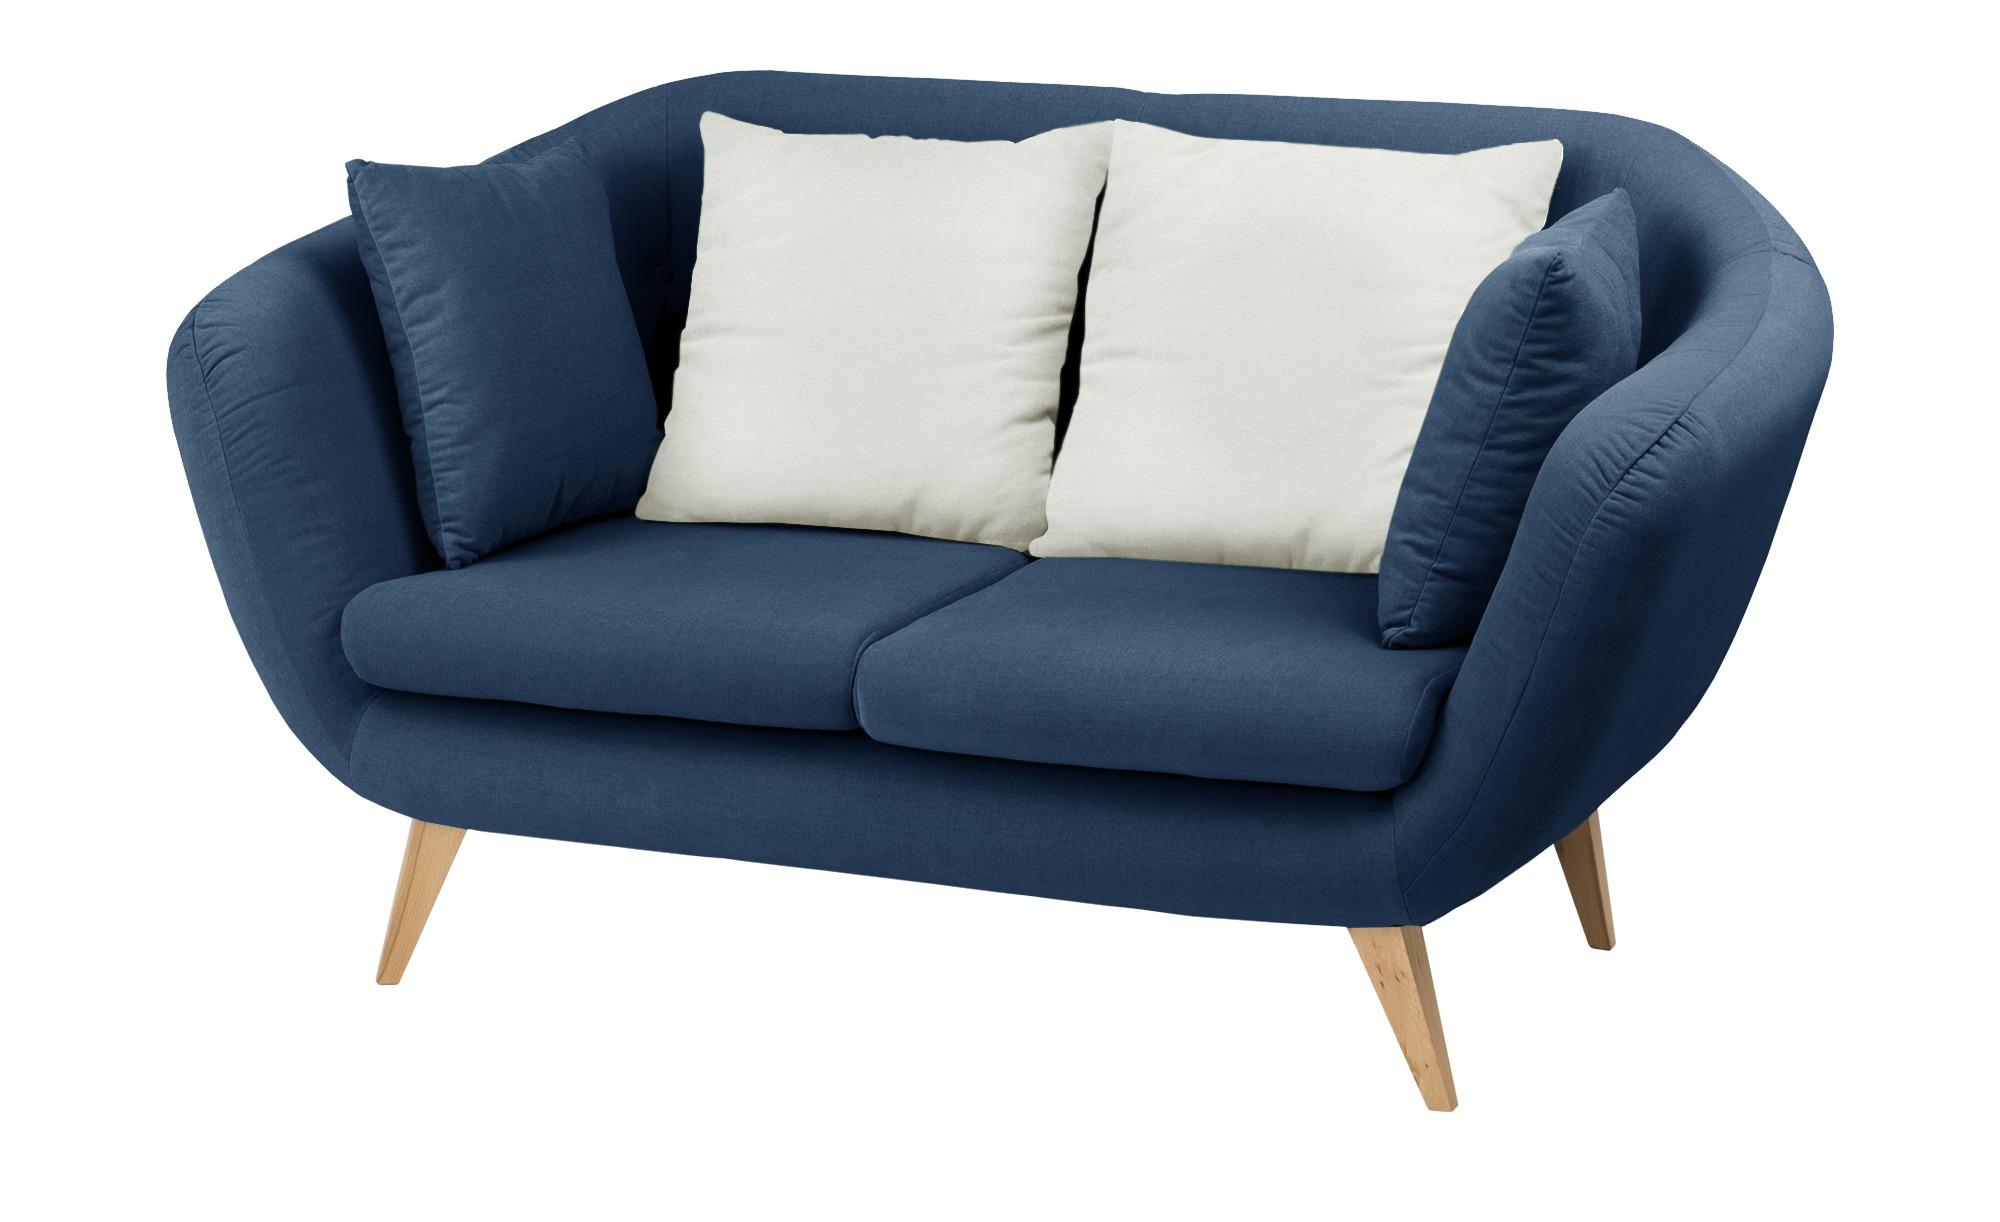 smart Sofa  blau - Mikrofaser Ricarda ¦ blau ¦ Maße (cm): B: 176 H: 93 T: 90 Polstermöbel > Sofas > 2-Sitzer - Höffner